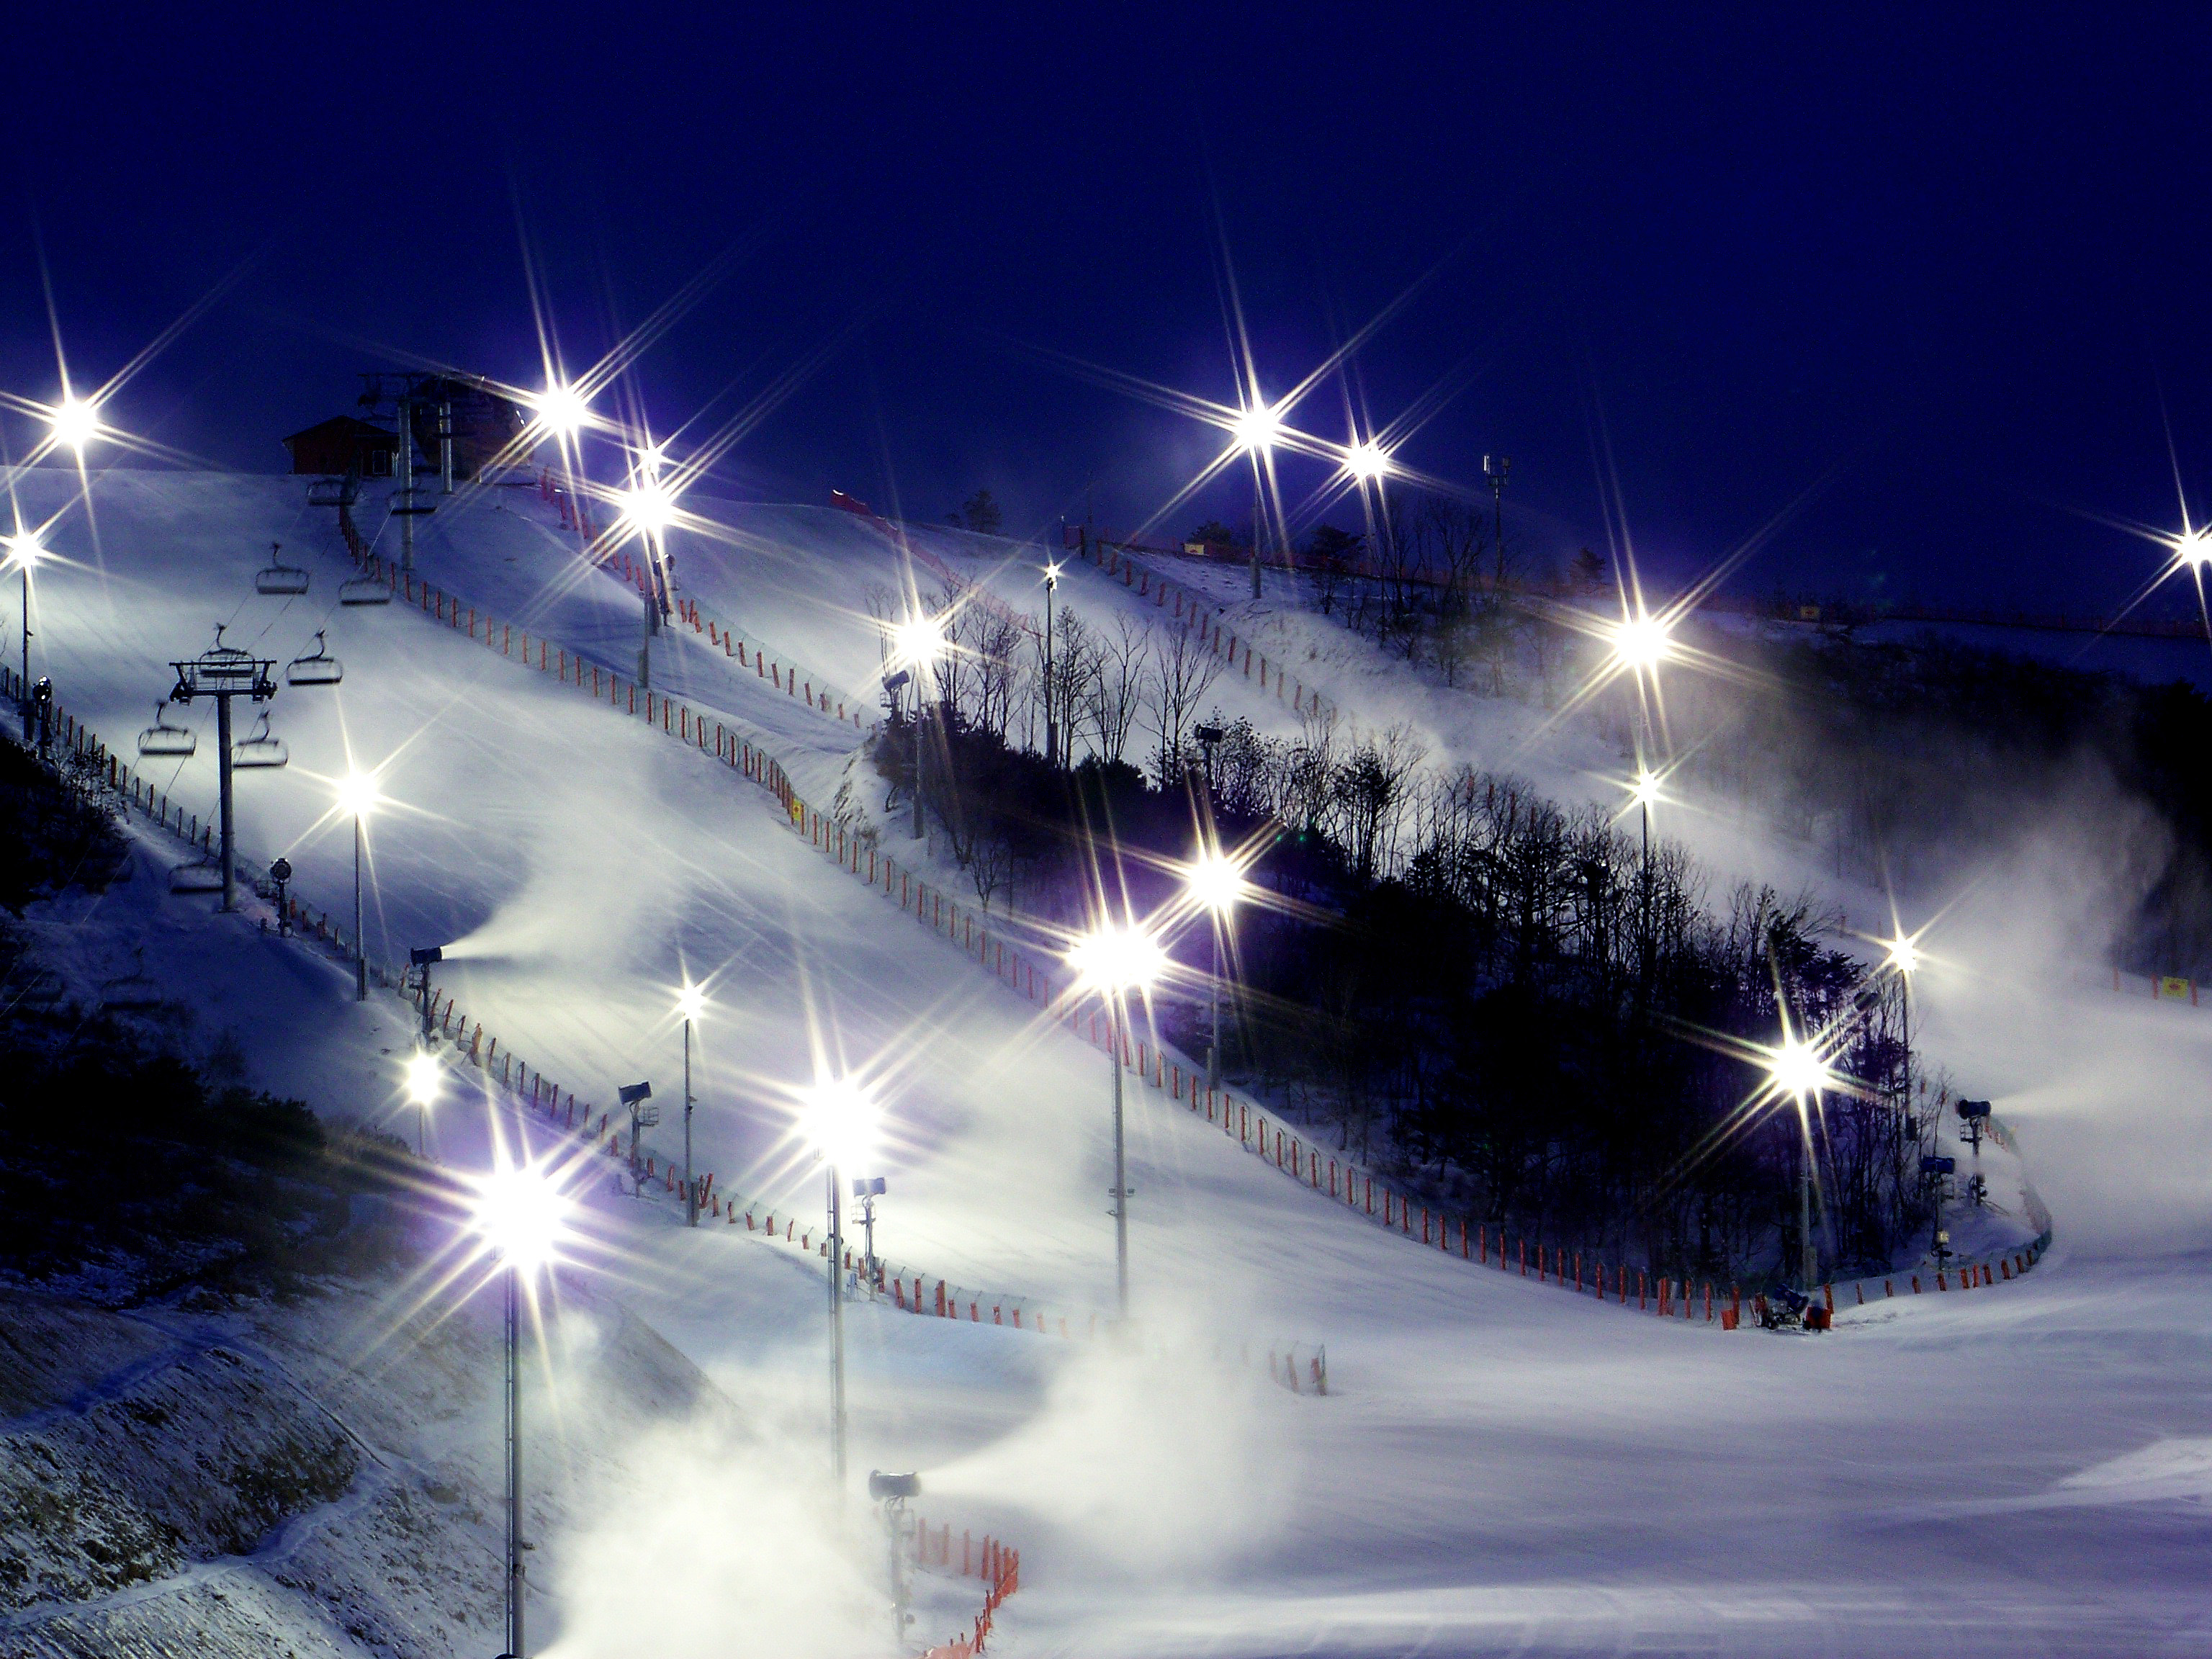 (Winter) Eden Valley Ski Resort Night Ski Tour